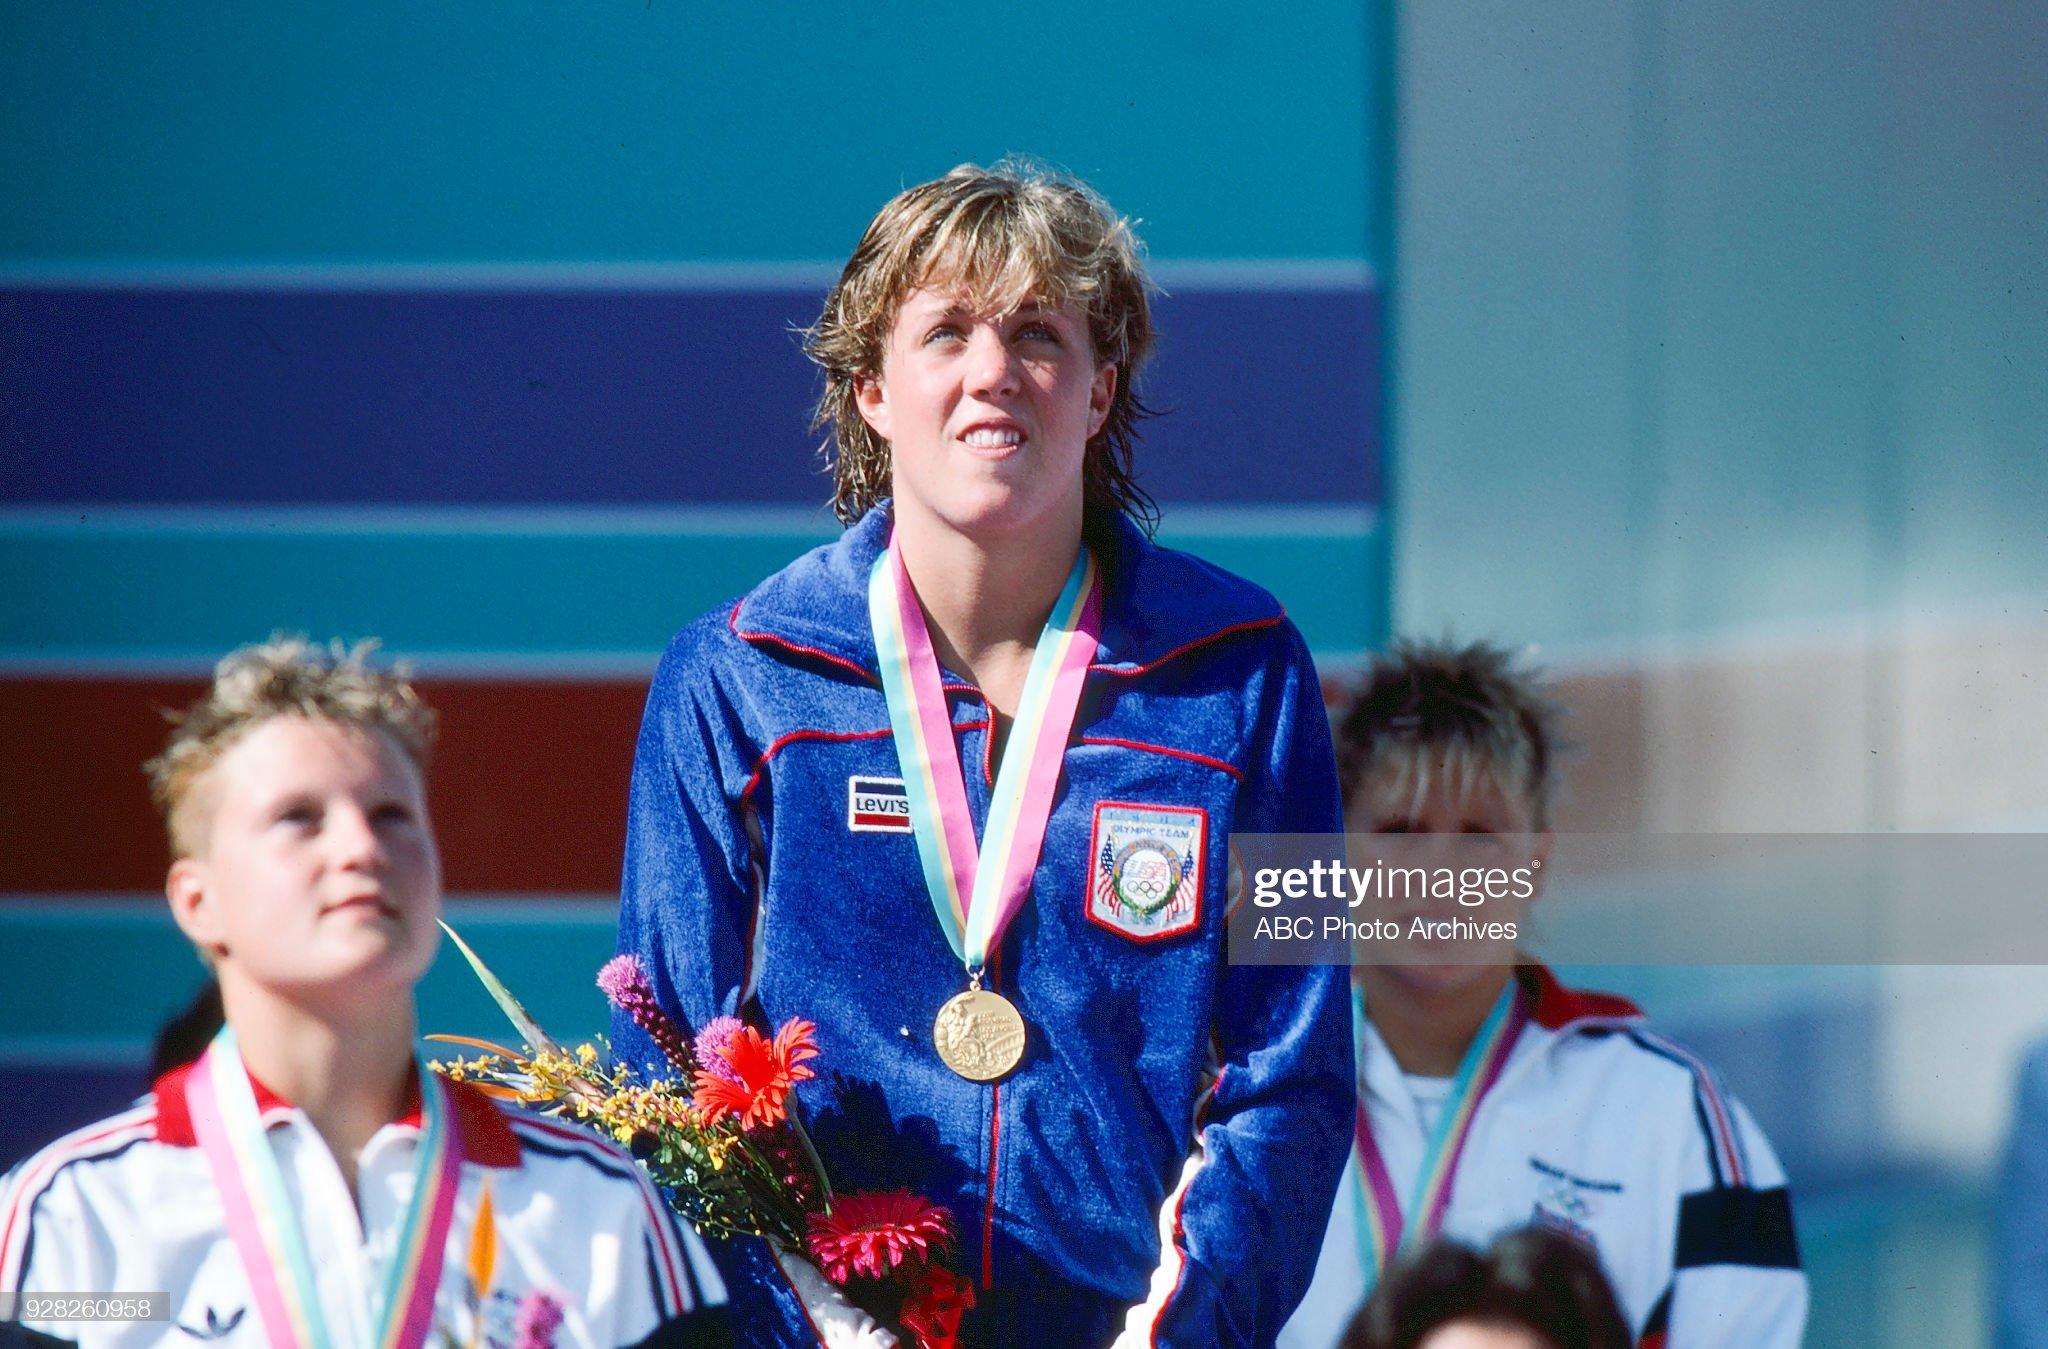 Women's Swimming 400 Metre Freestyle Medal ceremony At The 1984 Summer Olympics : Fotografía de noticias